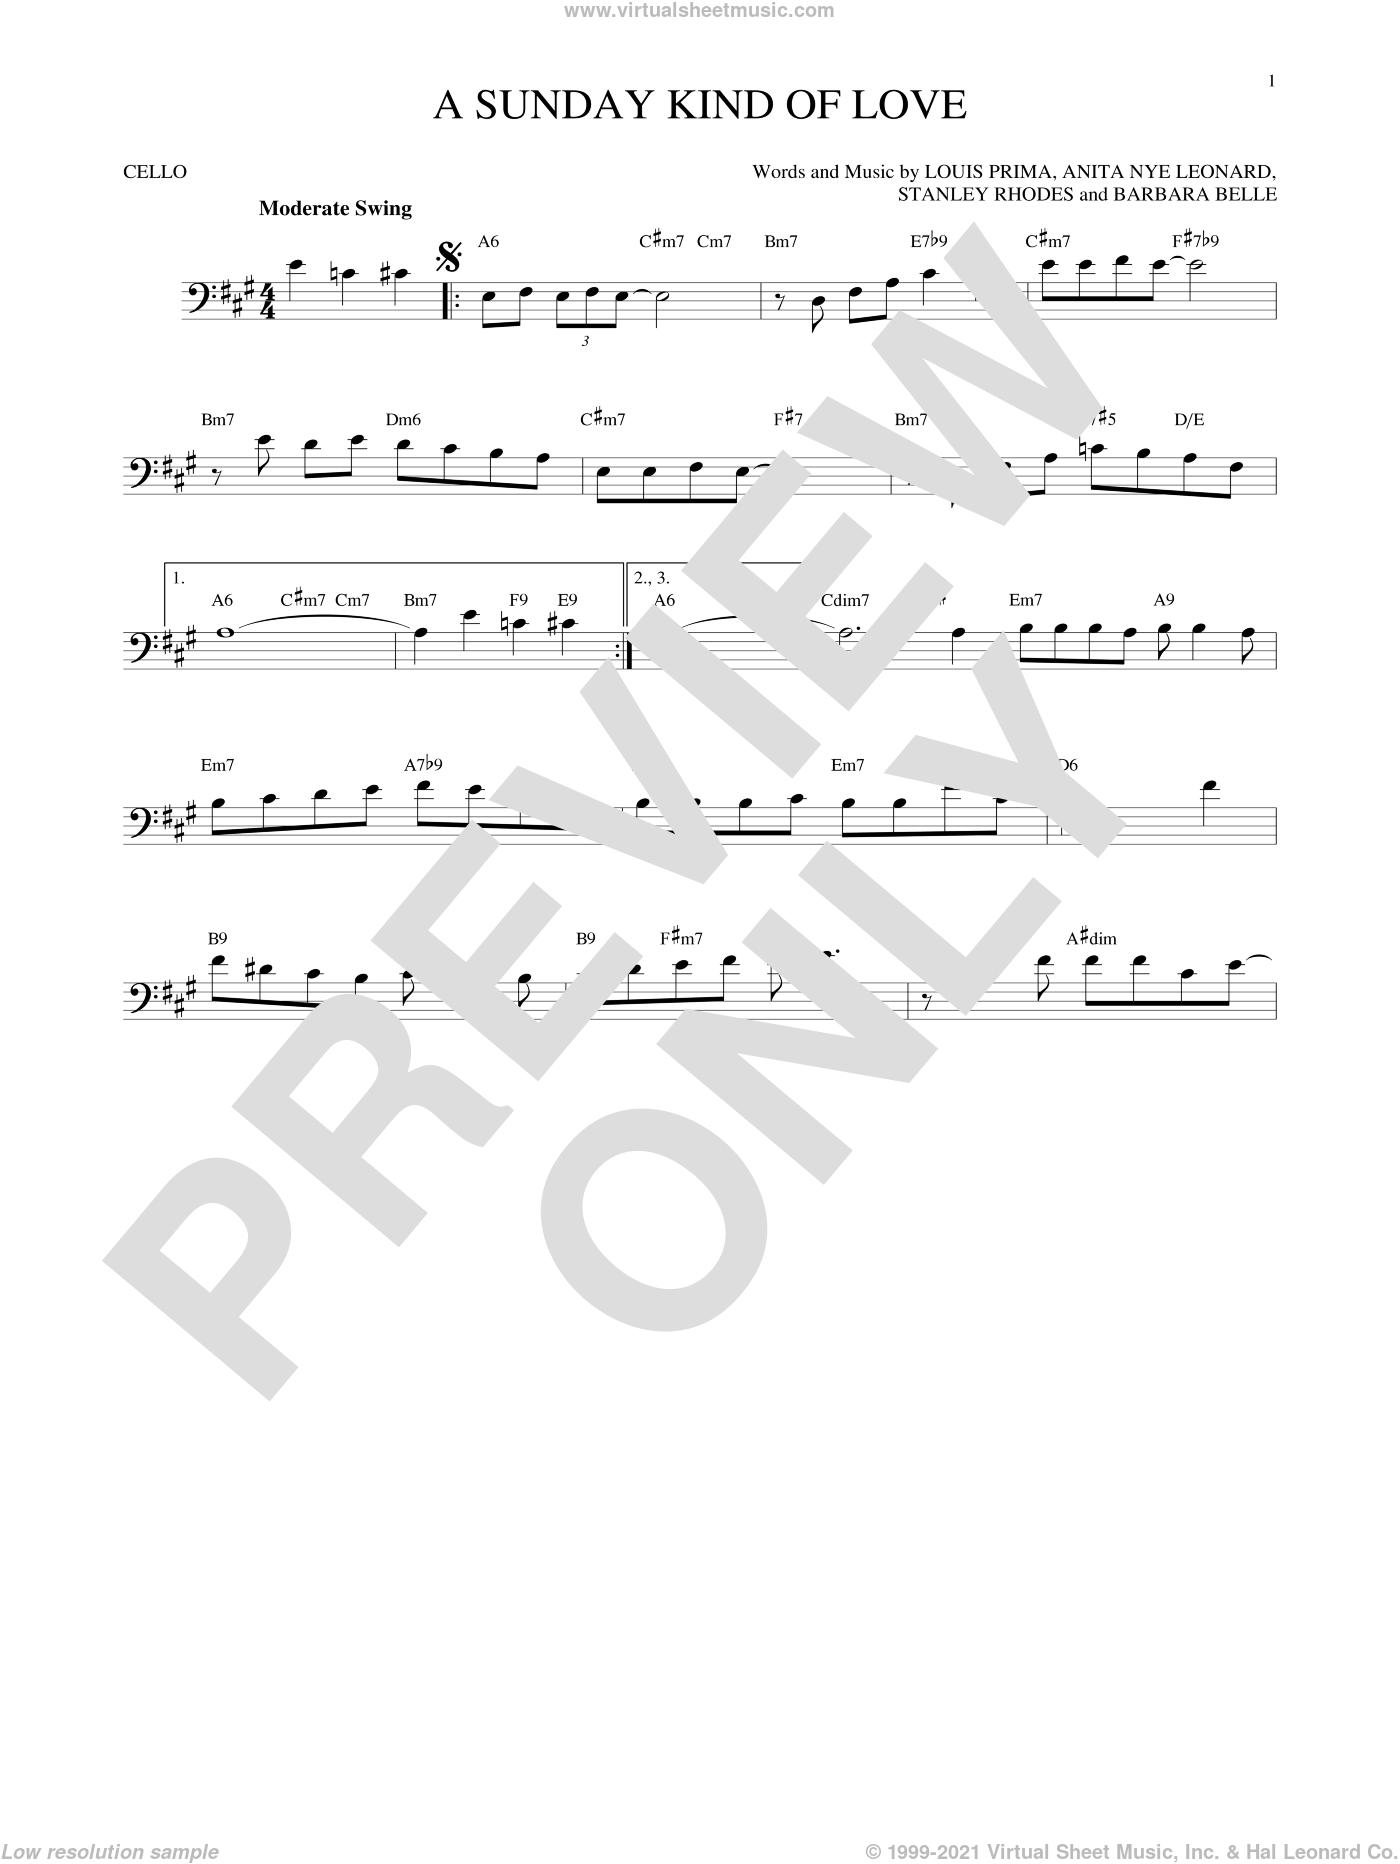 A Sunday Kind Of Love sheet music for cello solo by Etta James, Reba McEntire, Anita Nye Leonard, Barbara Belle, Louis Prima and Stanley Rhodes, intermediate skill level